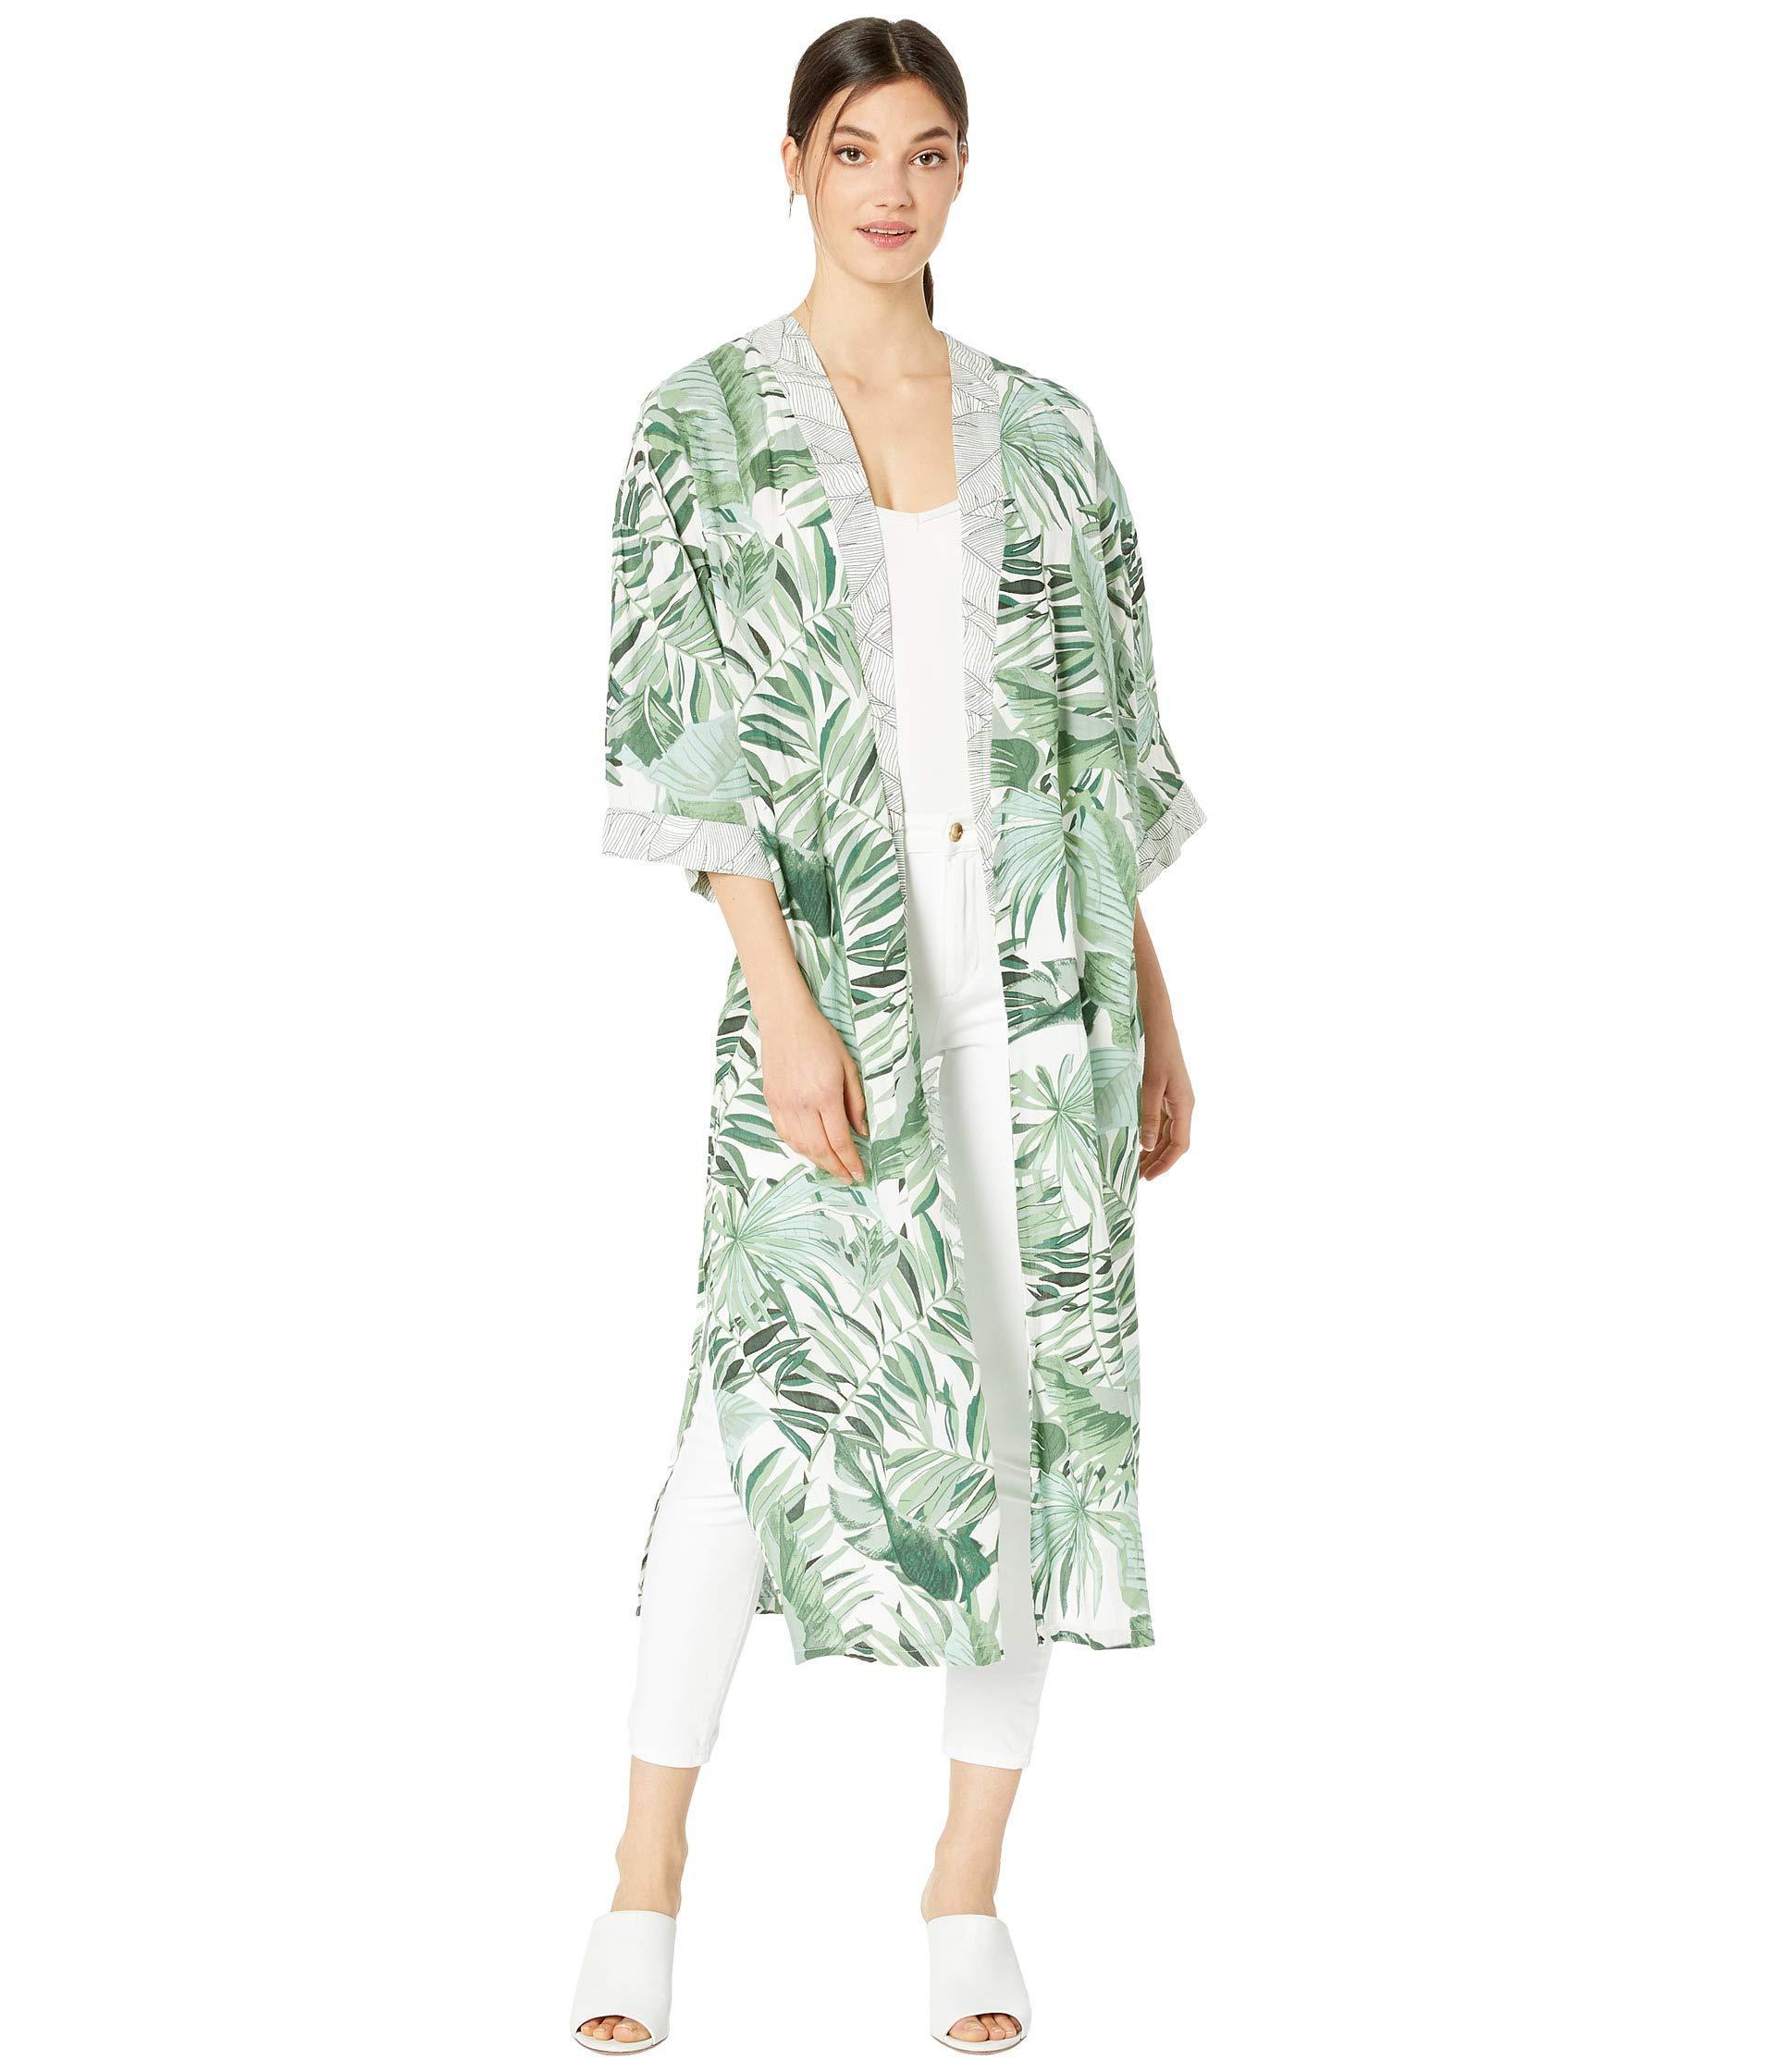 97749c7b10 Lyst - Rip Curl Palm Reader Kimono (green) Women s Clothing in Green